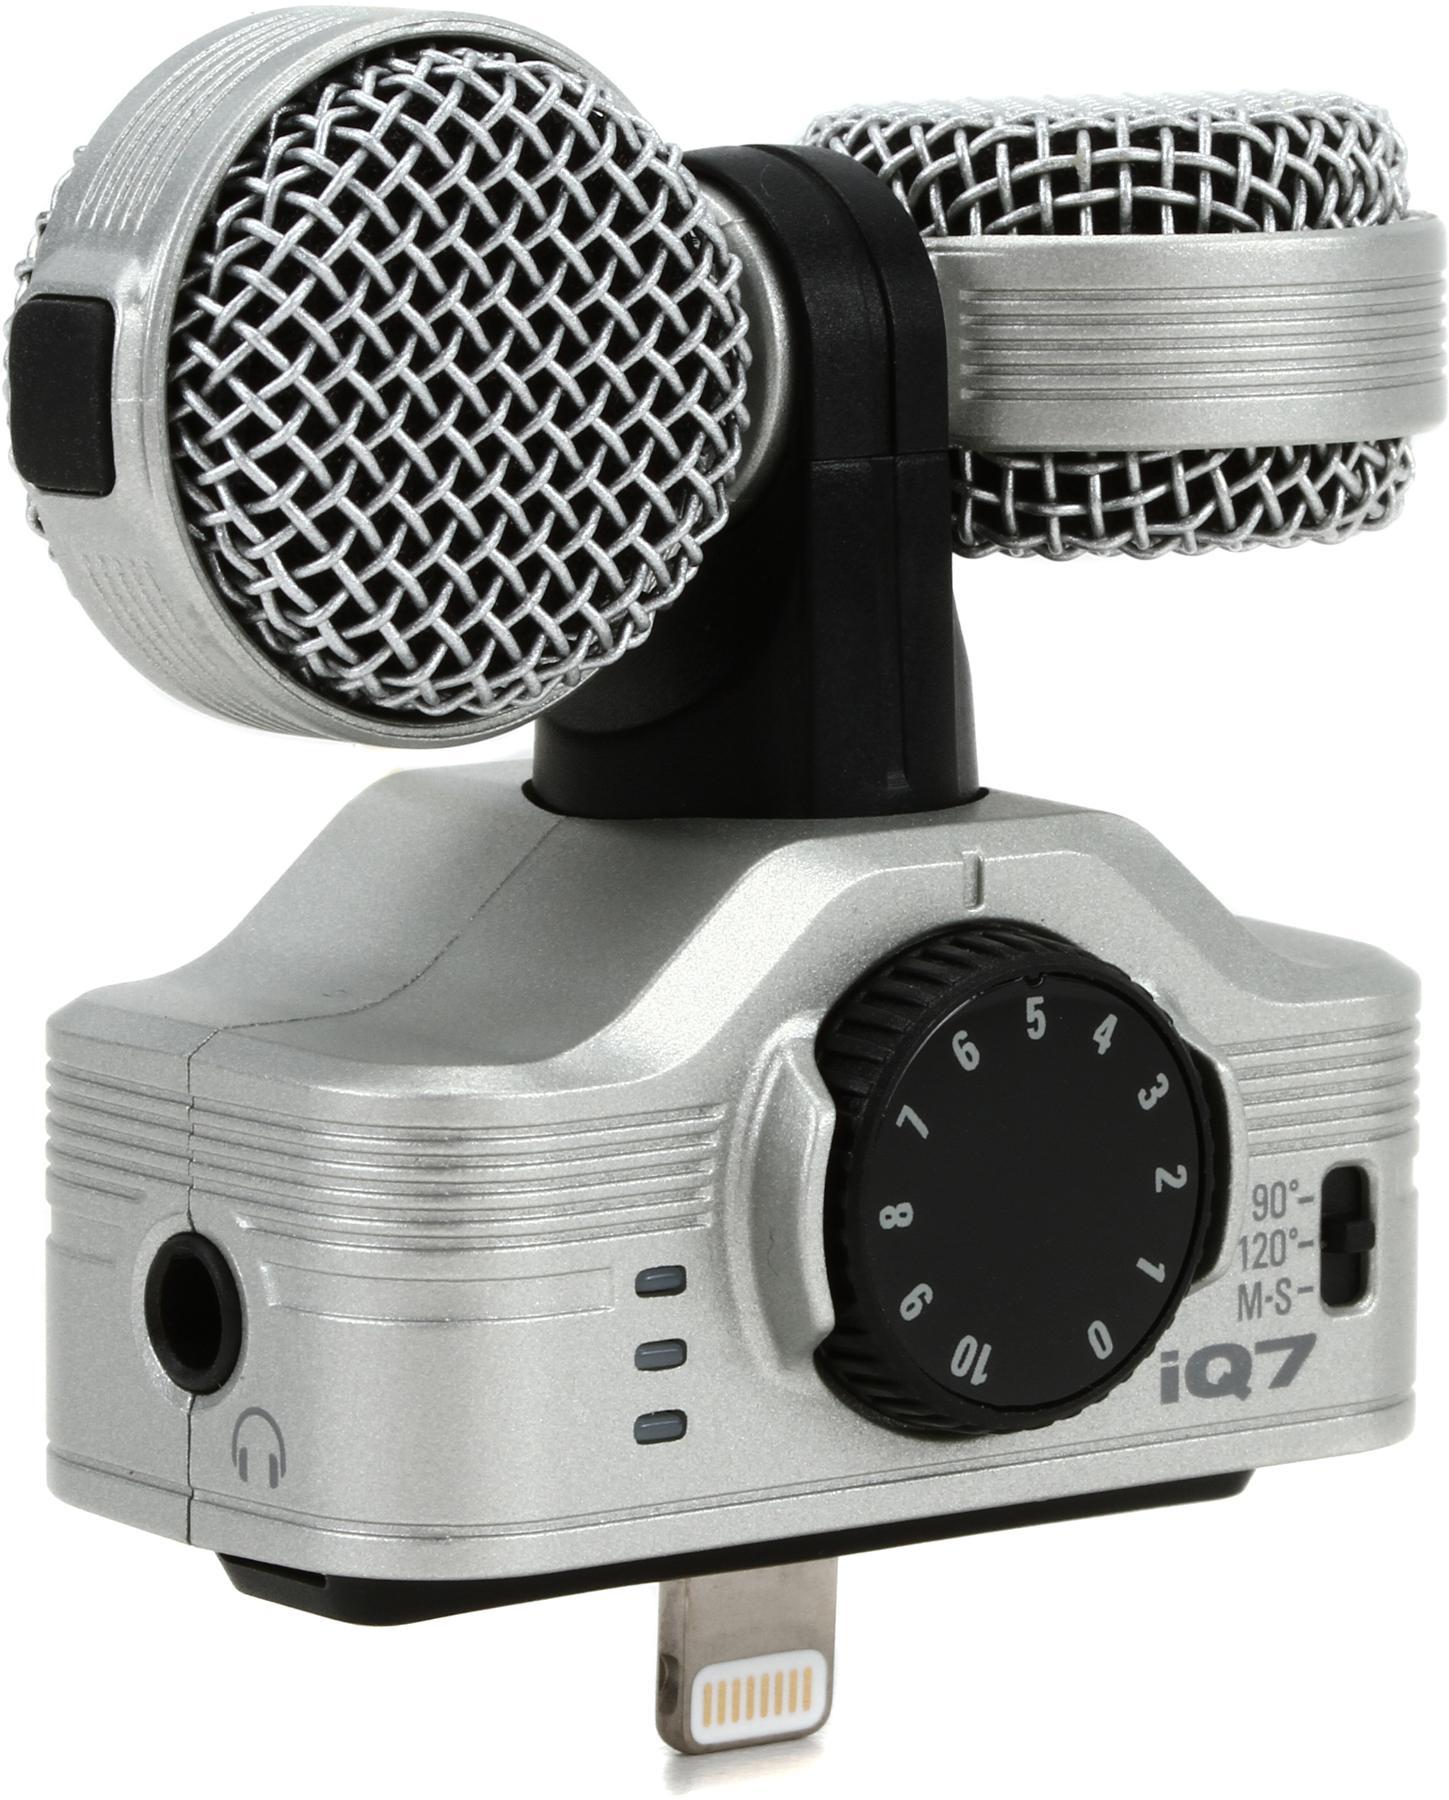 4. Zoom iQ7 Rotating Mid Side Stereo Capsule